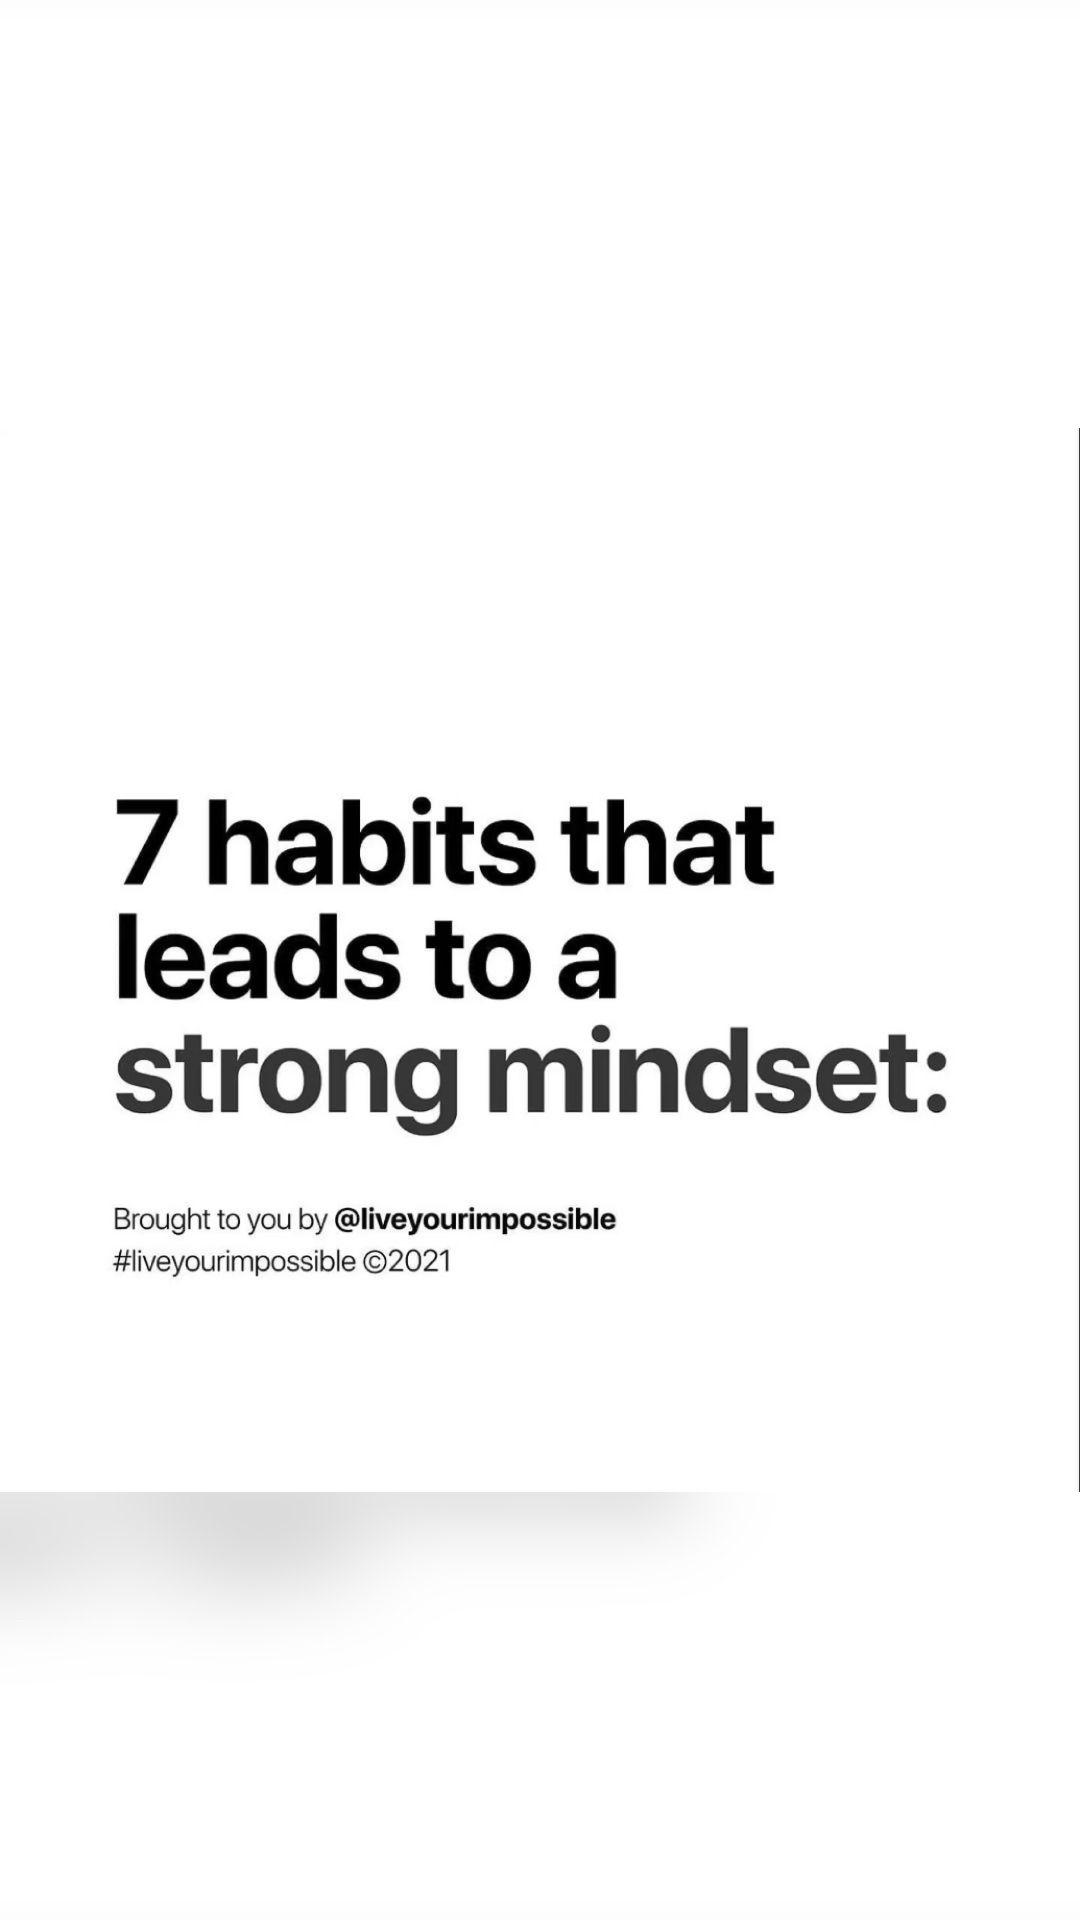 Strong mindset